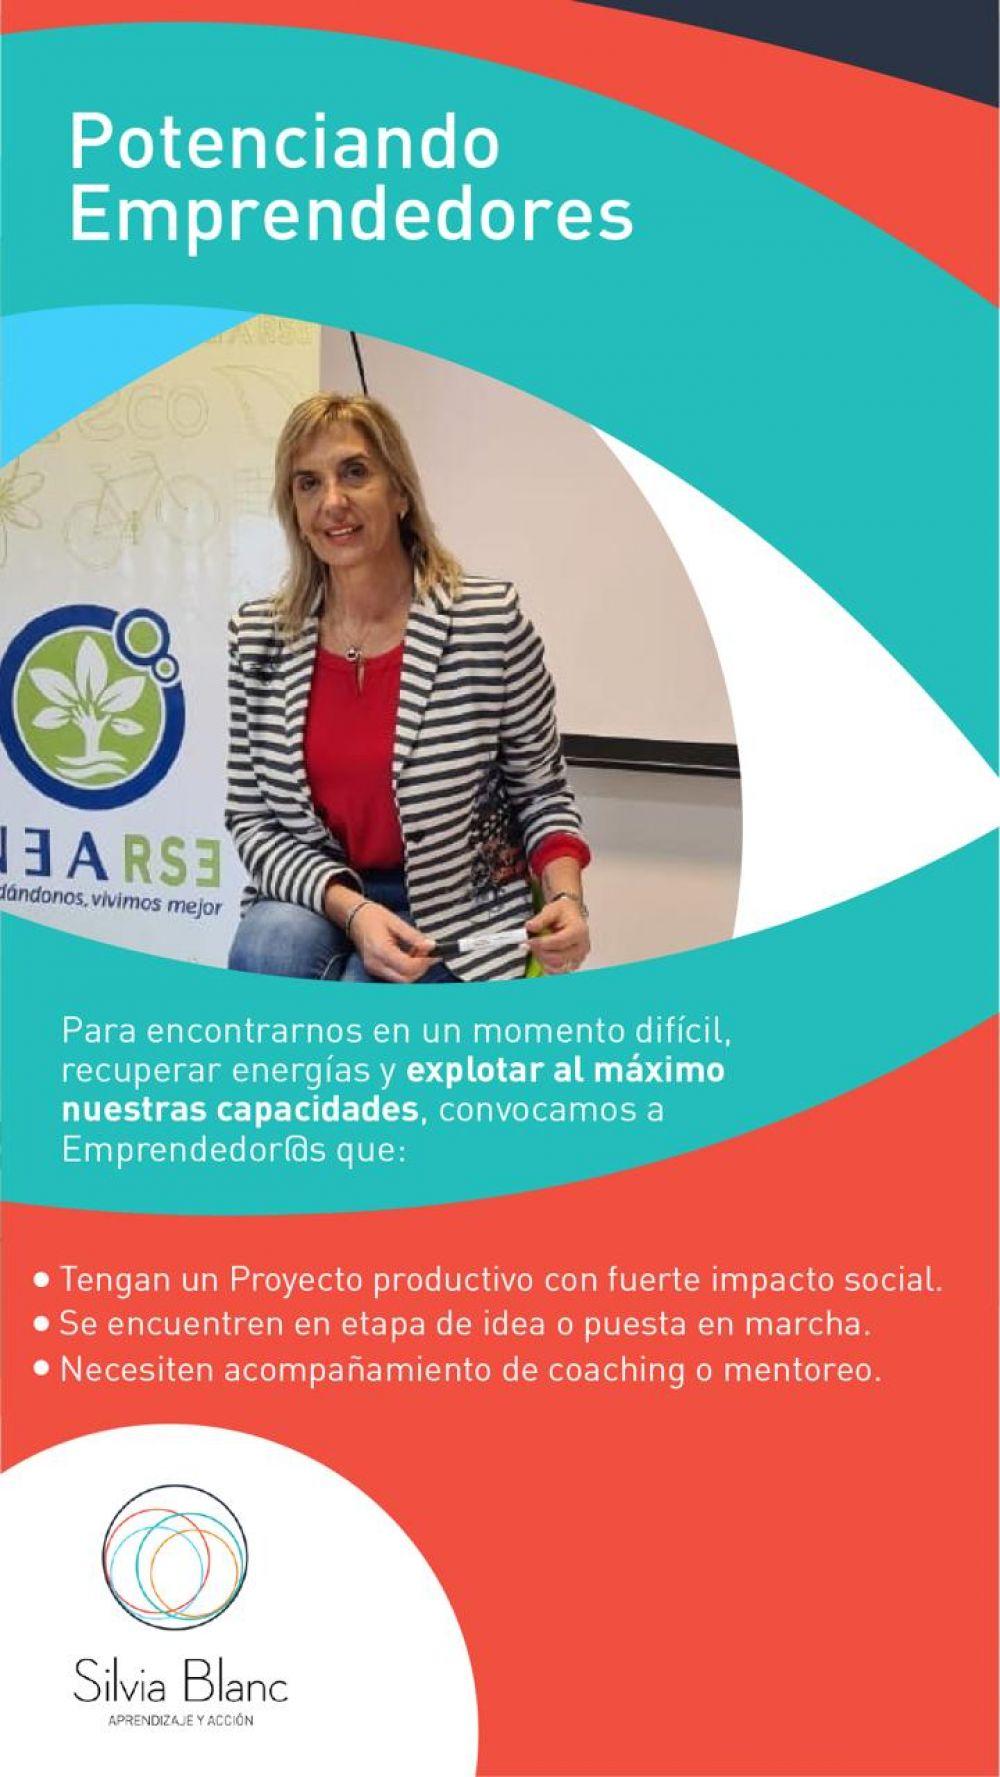 Coach empresarial gratuito para emprendedores correntinos